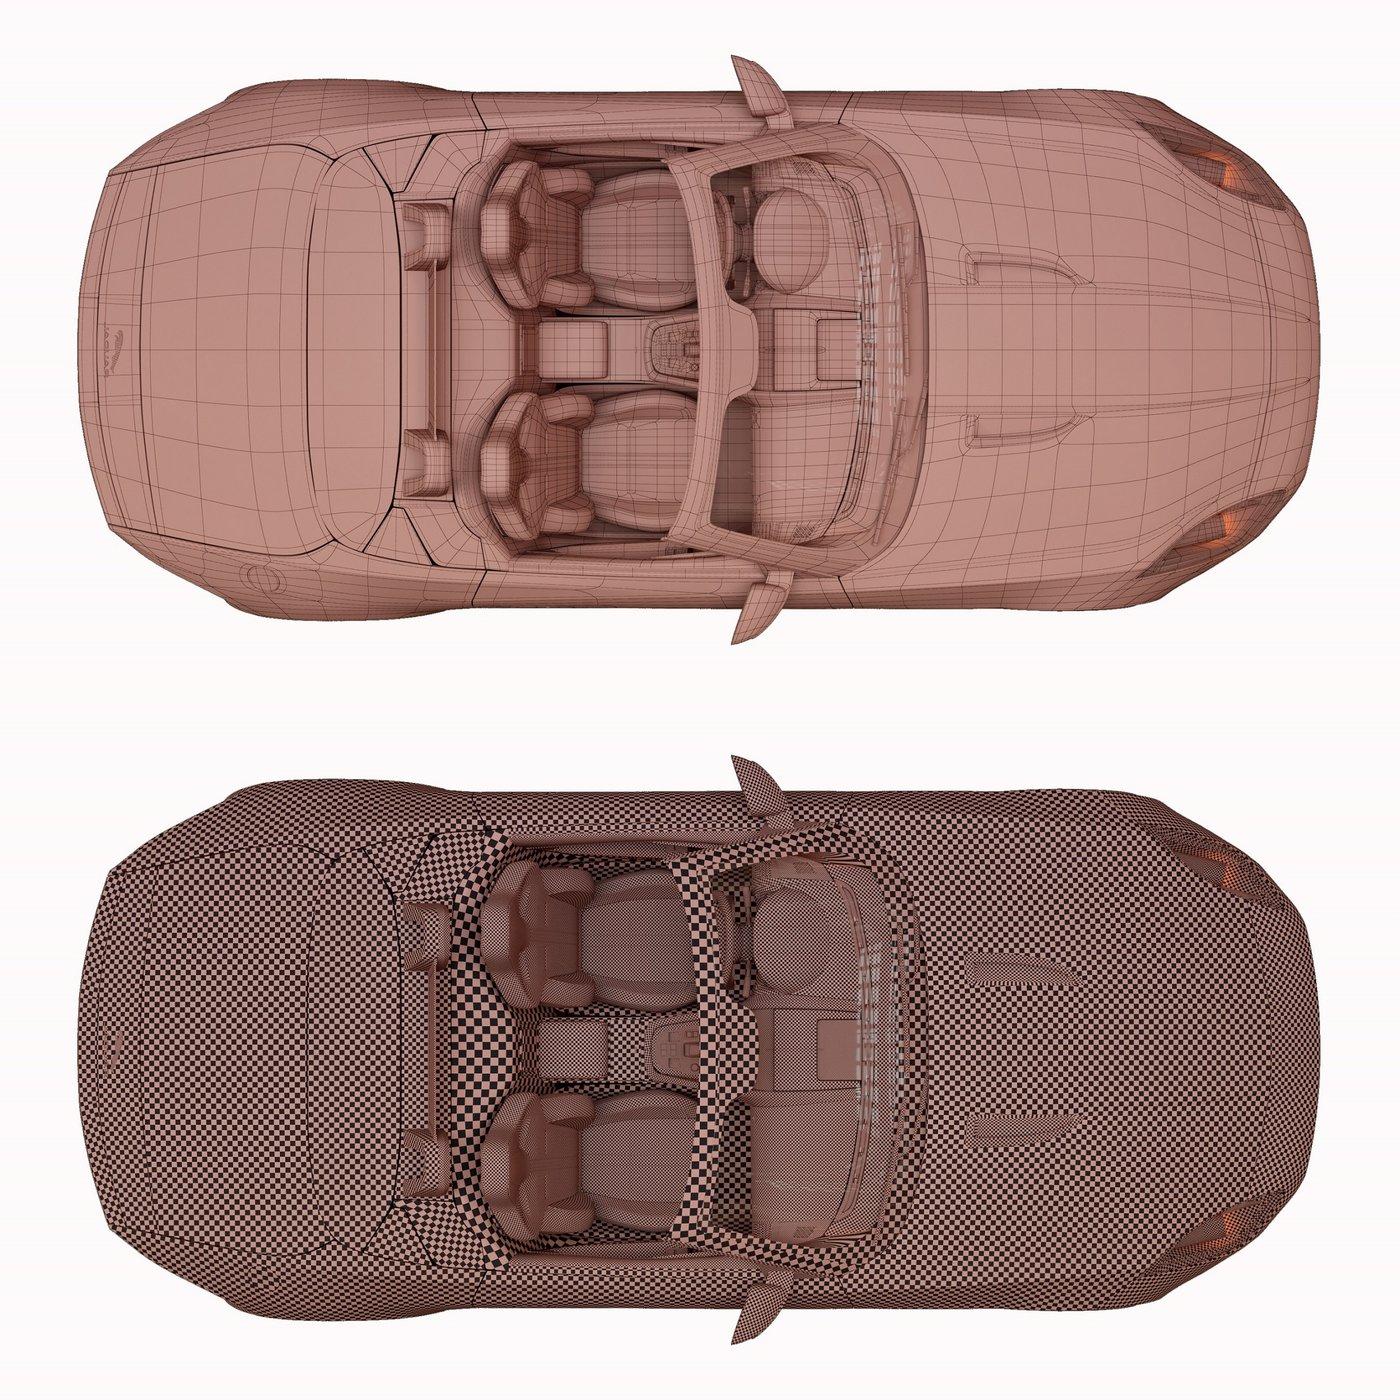 Jaguar F TYPE With HQ Interior 3D model